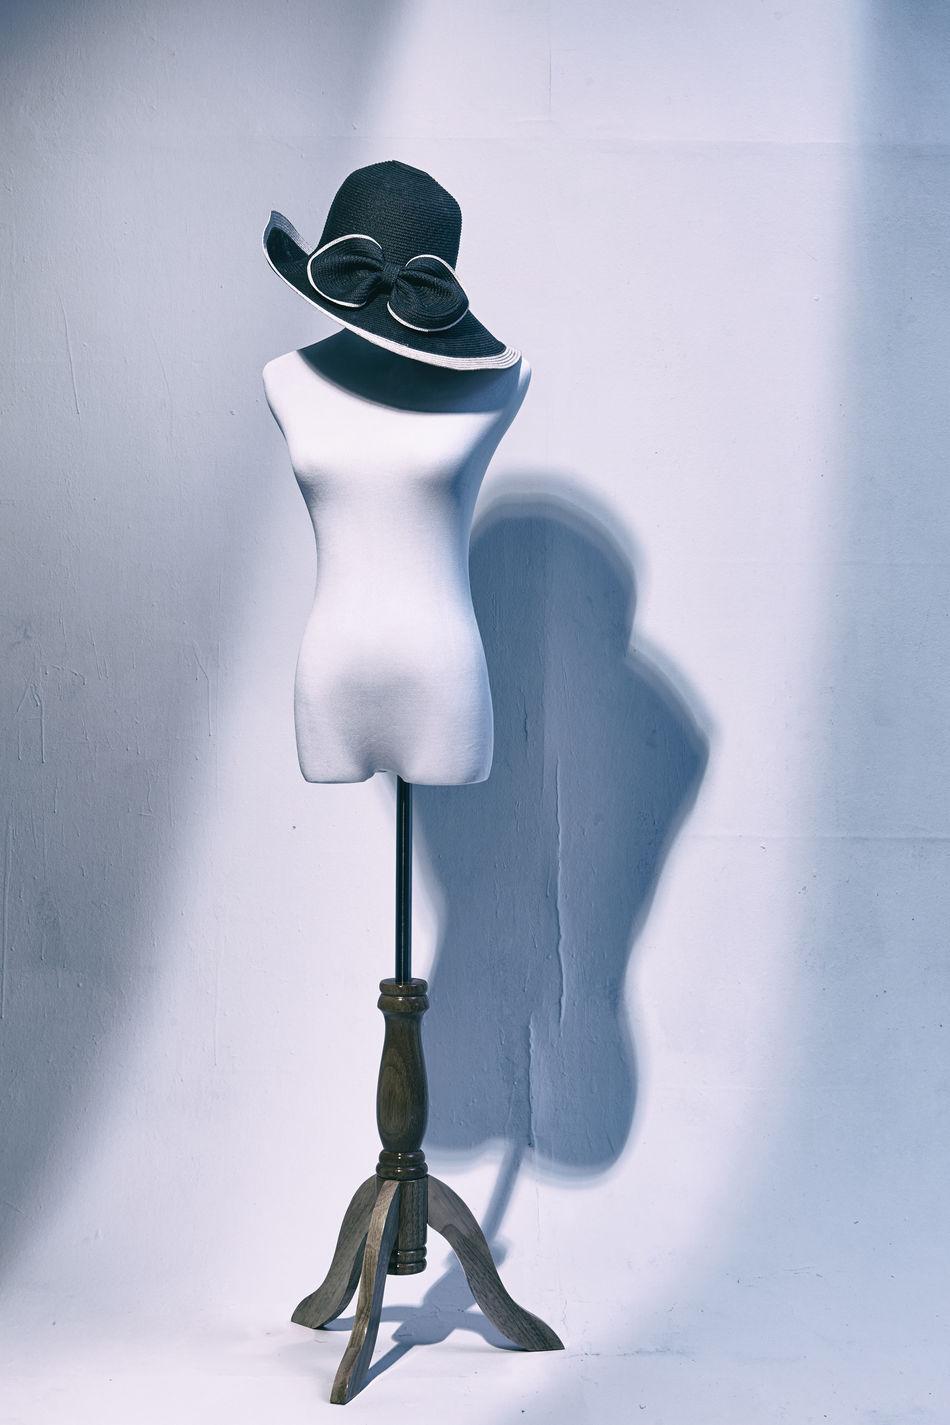 Beautiful stock photos of fashion, no people, indoors, close-up, radiator